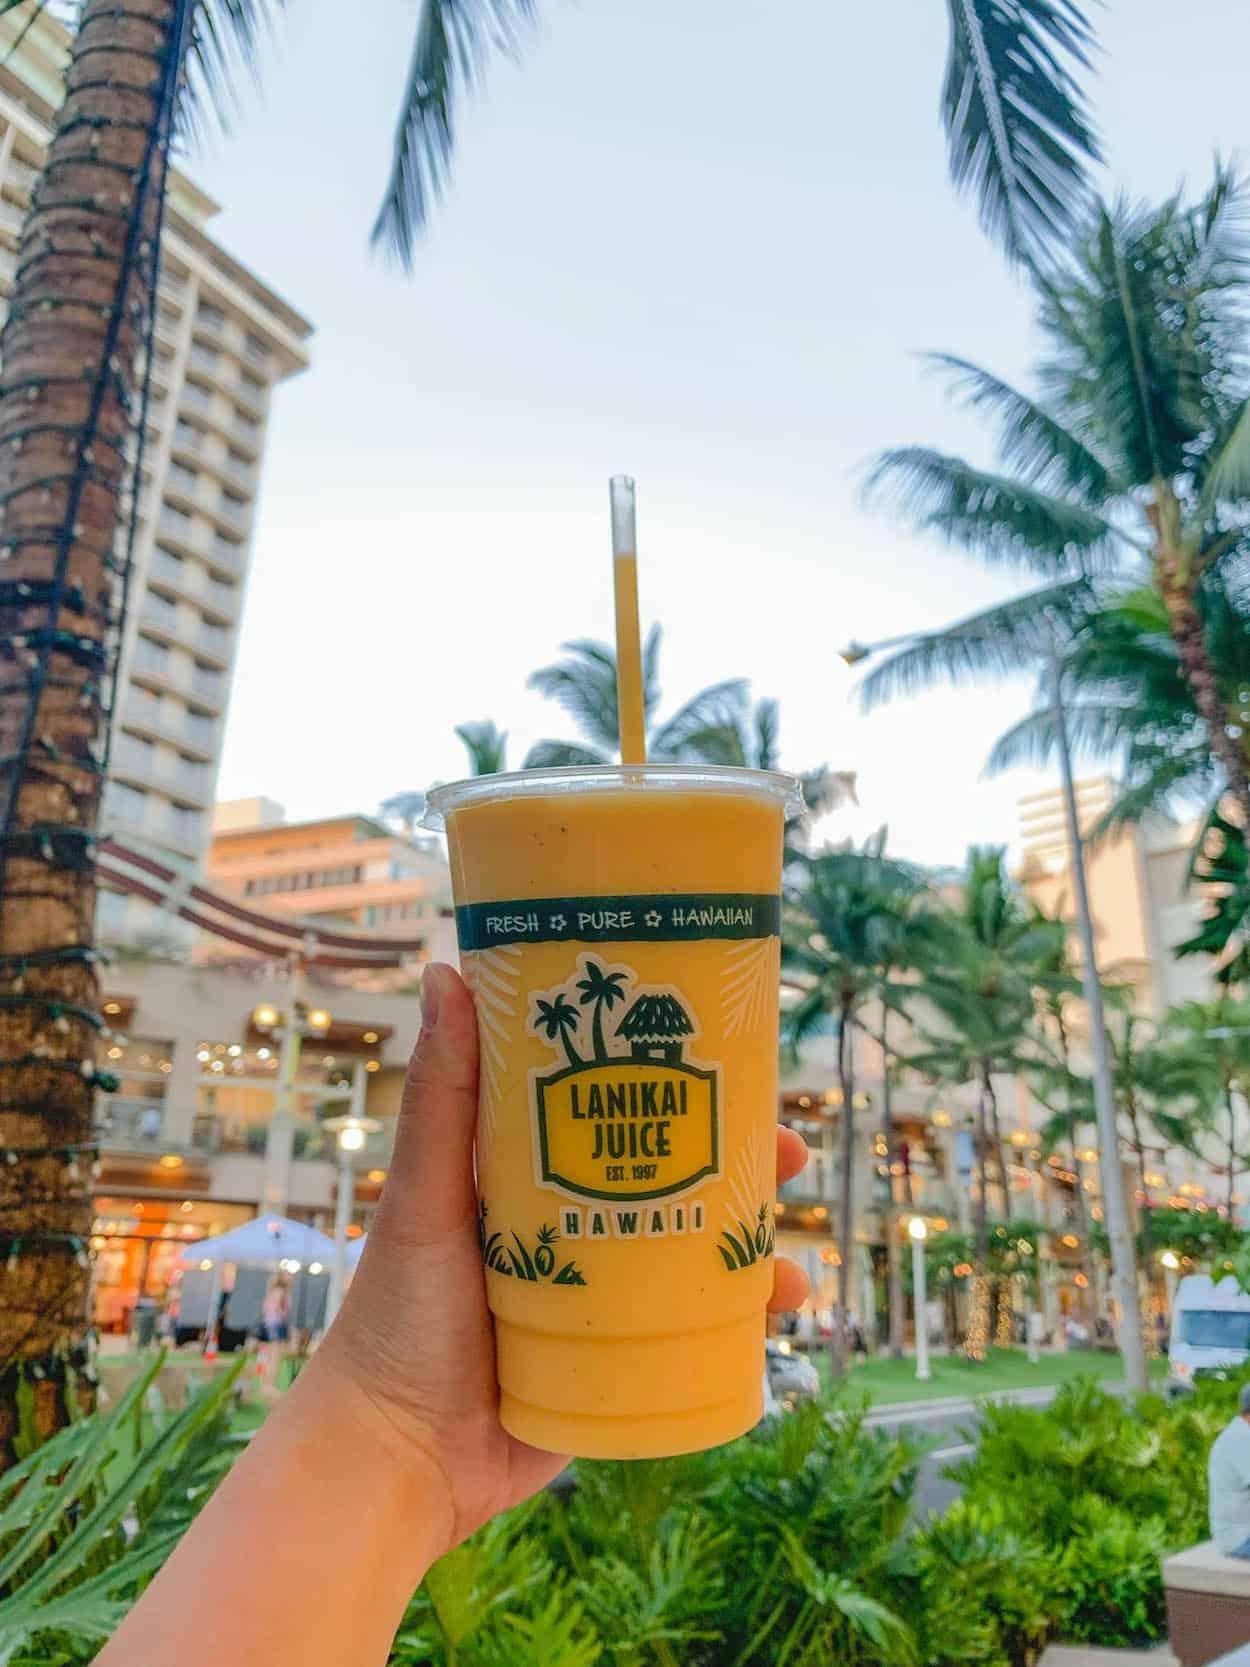 Lanikai Juice in Waikiki, Oahu, Hawaii